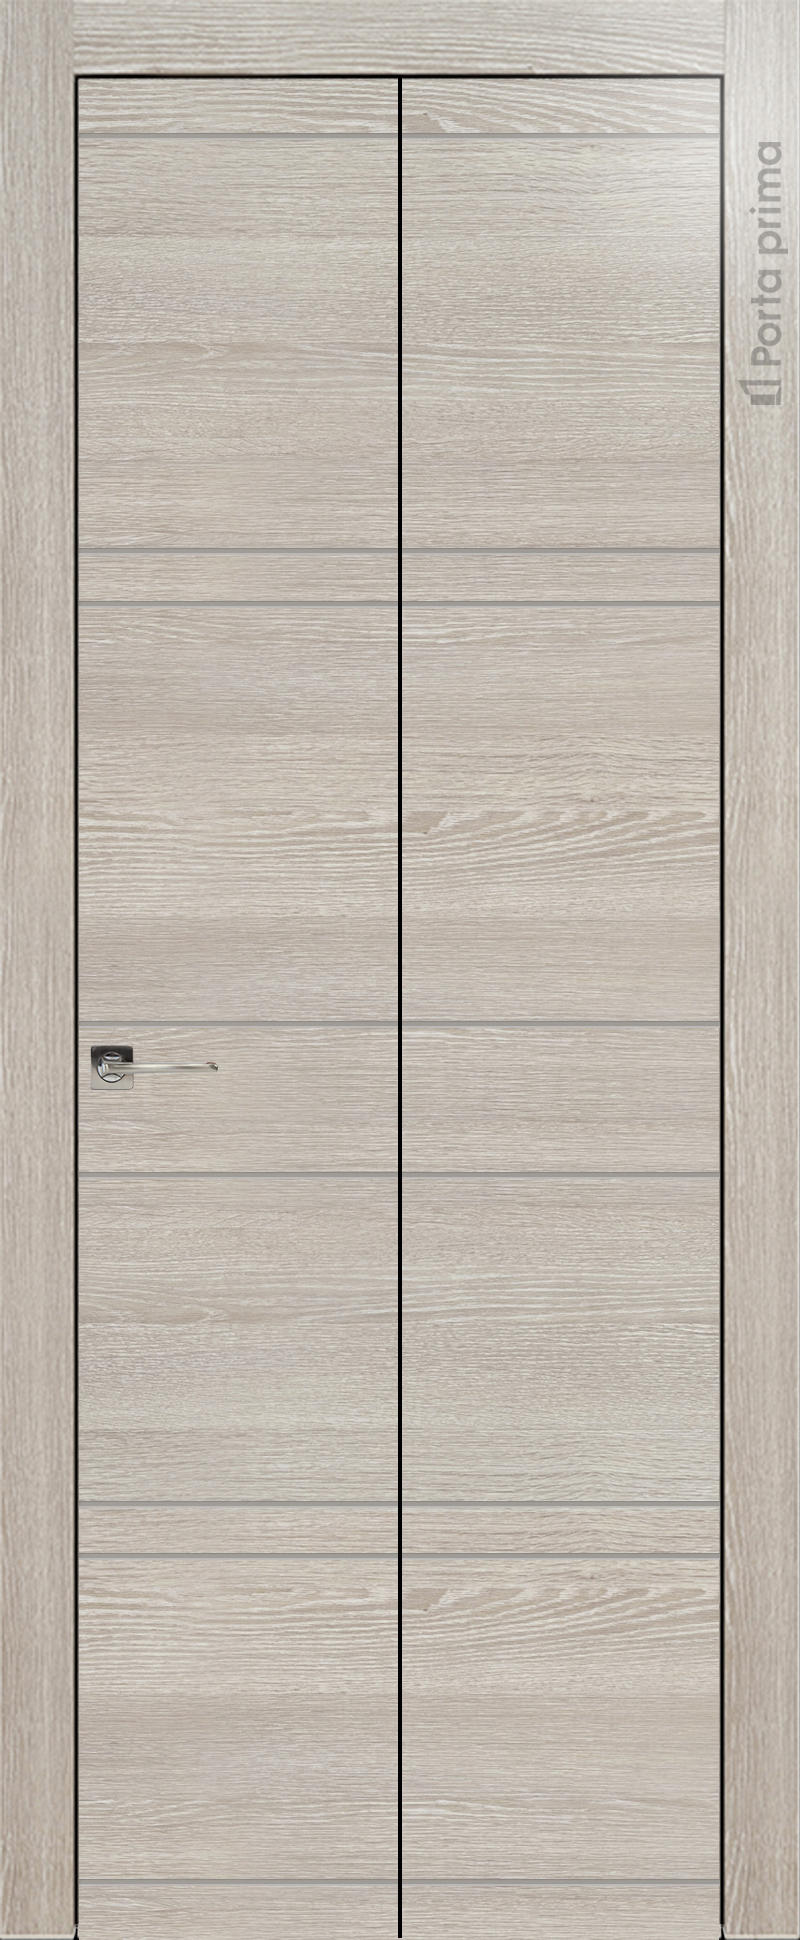 Tivoli Е-2 Книжка цвет - Серый дуб Без стекла (ДГ)